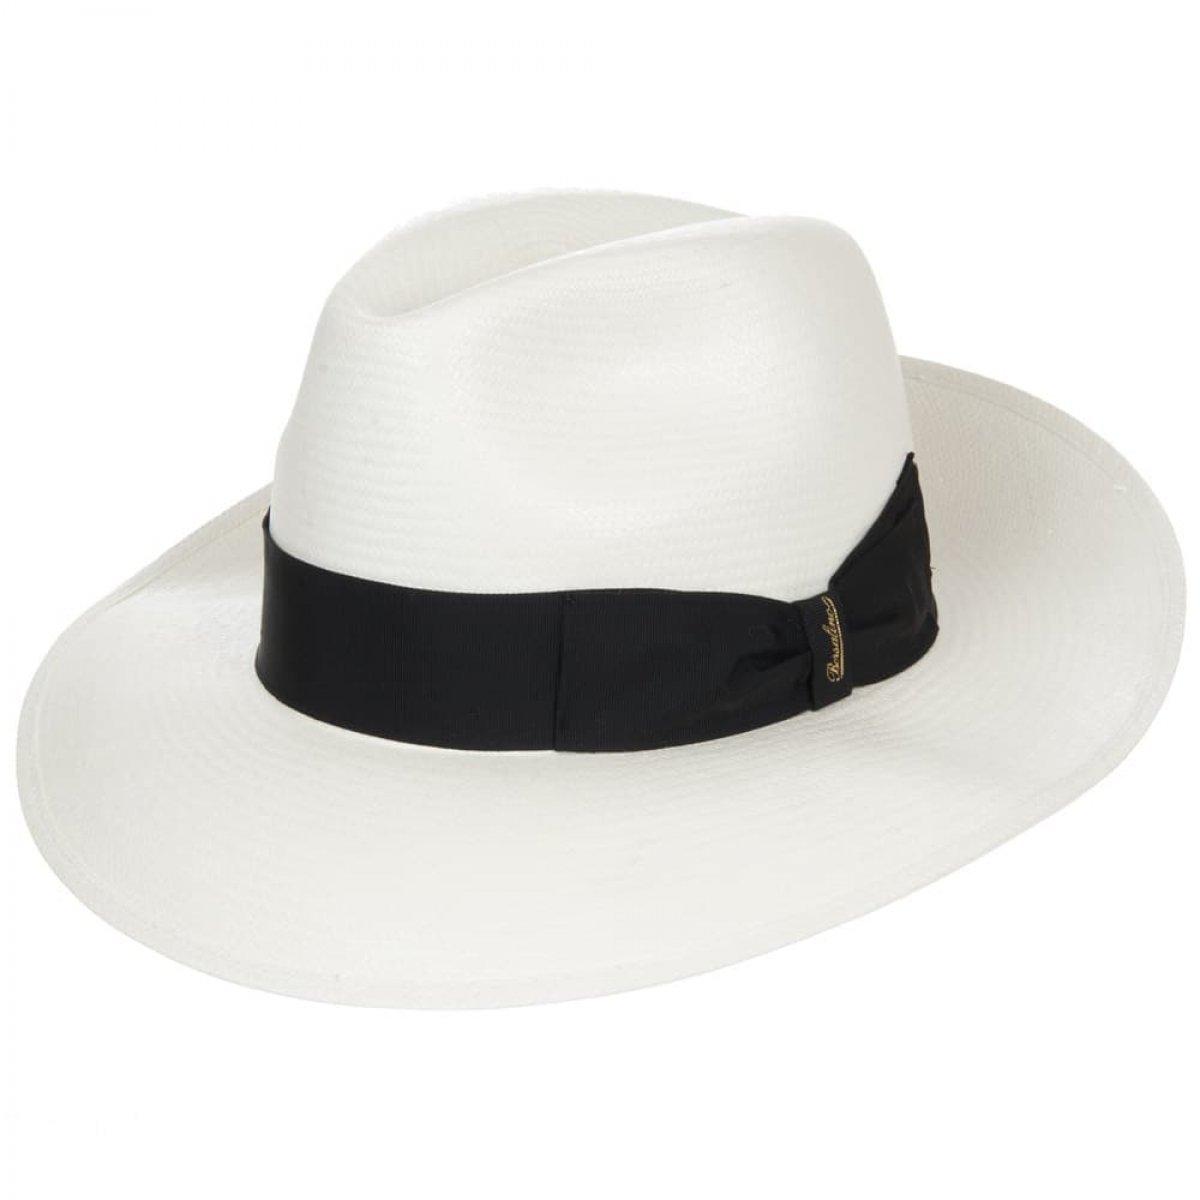 Cappello Panama a tesa larga firmato BORSALINO ... 3d055b2e0264